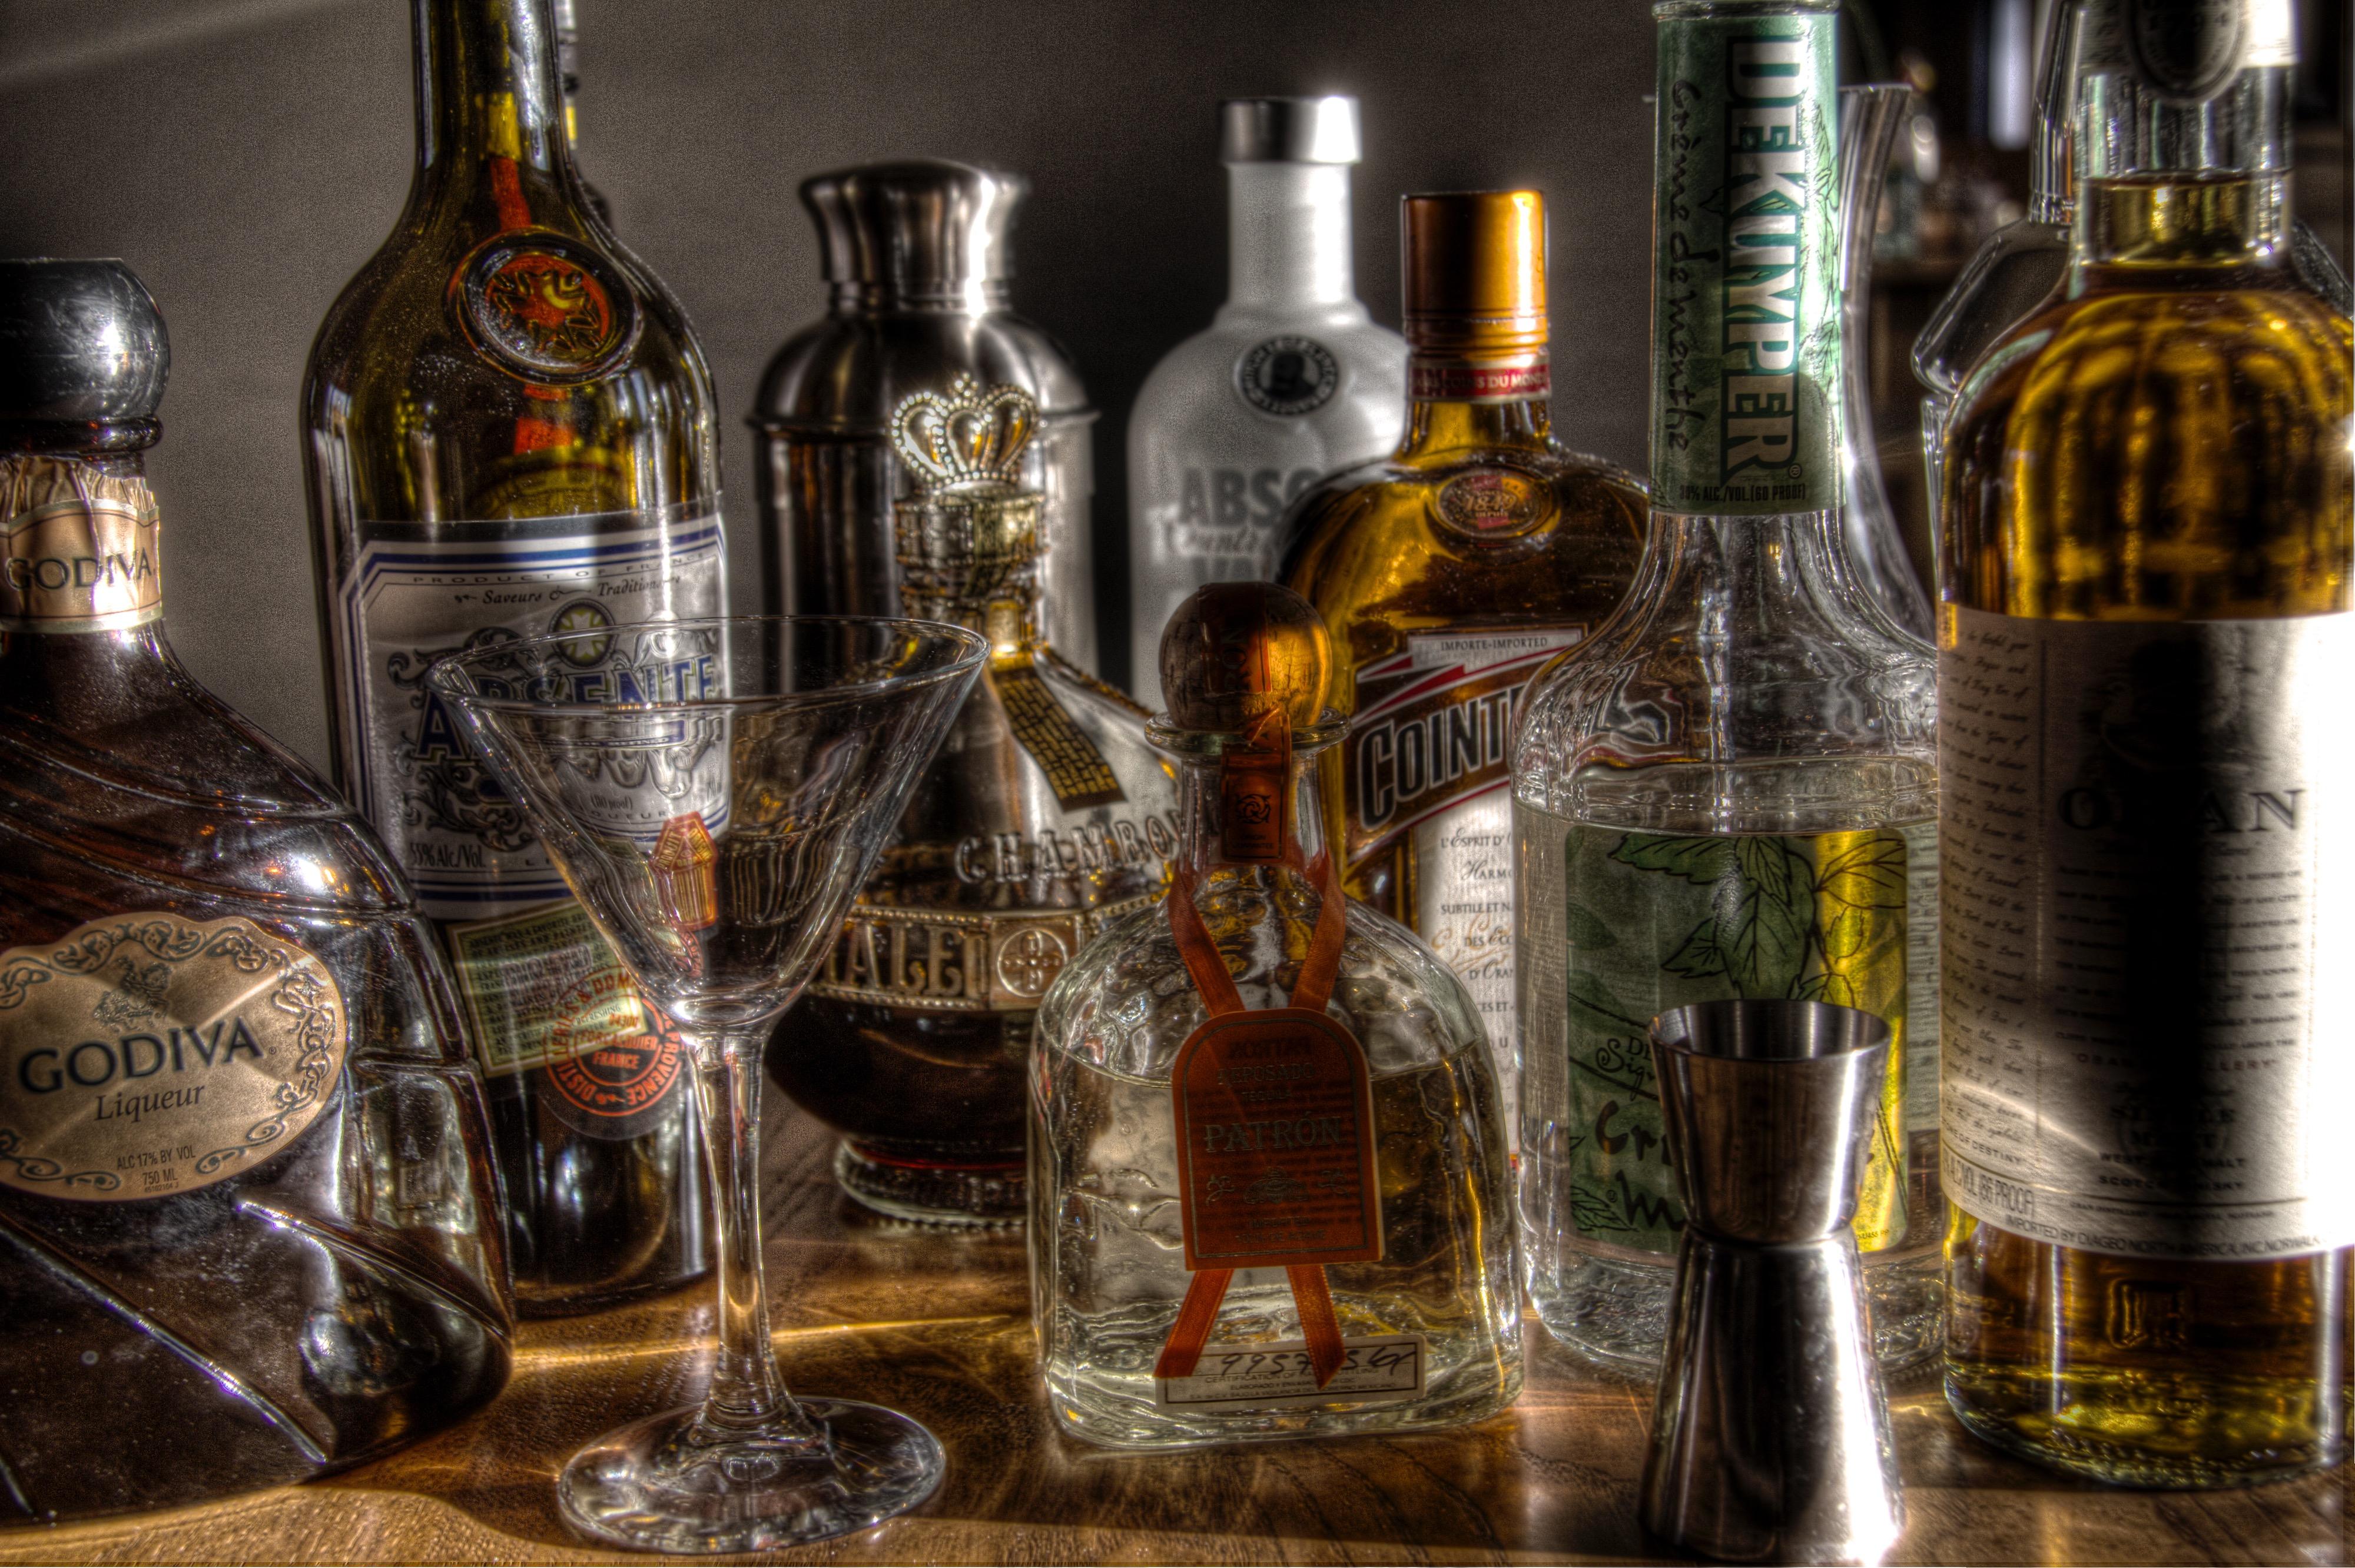 Everyday Surreal Bottles